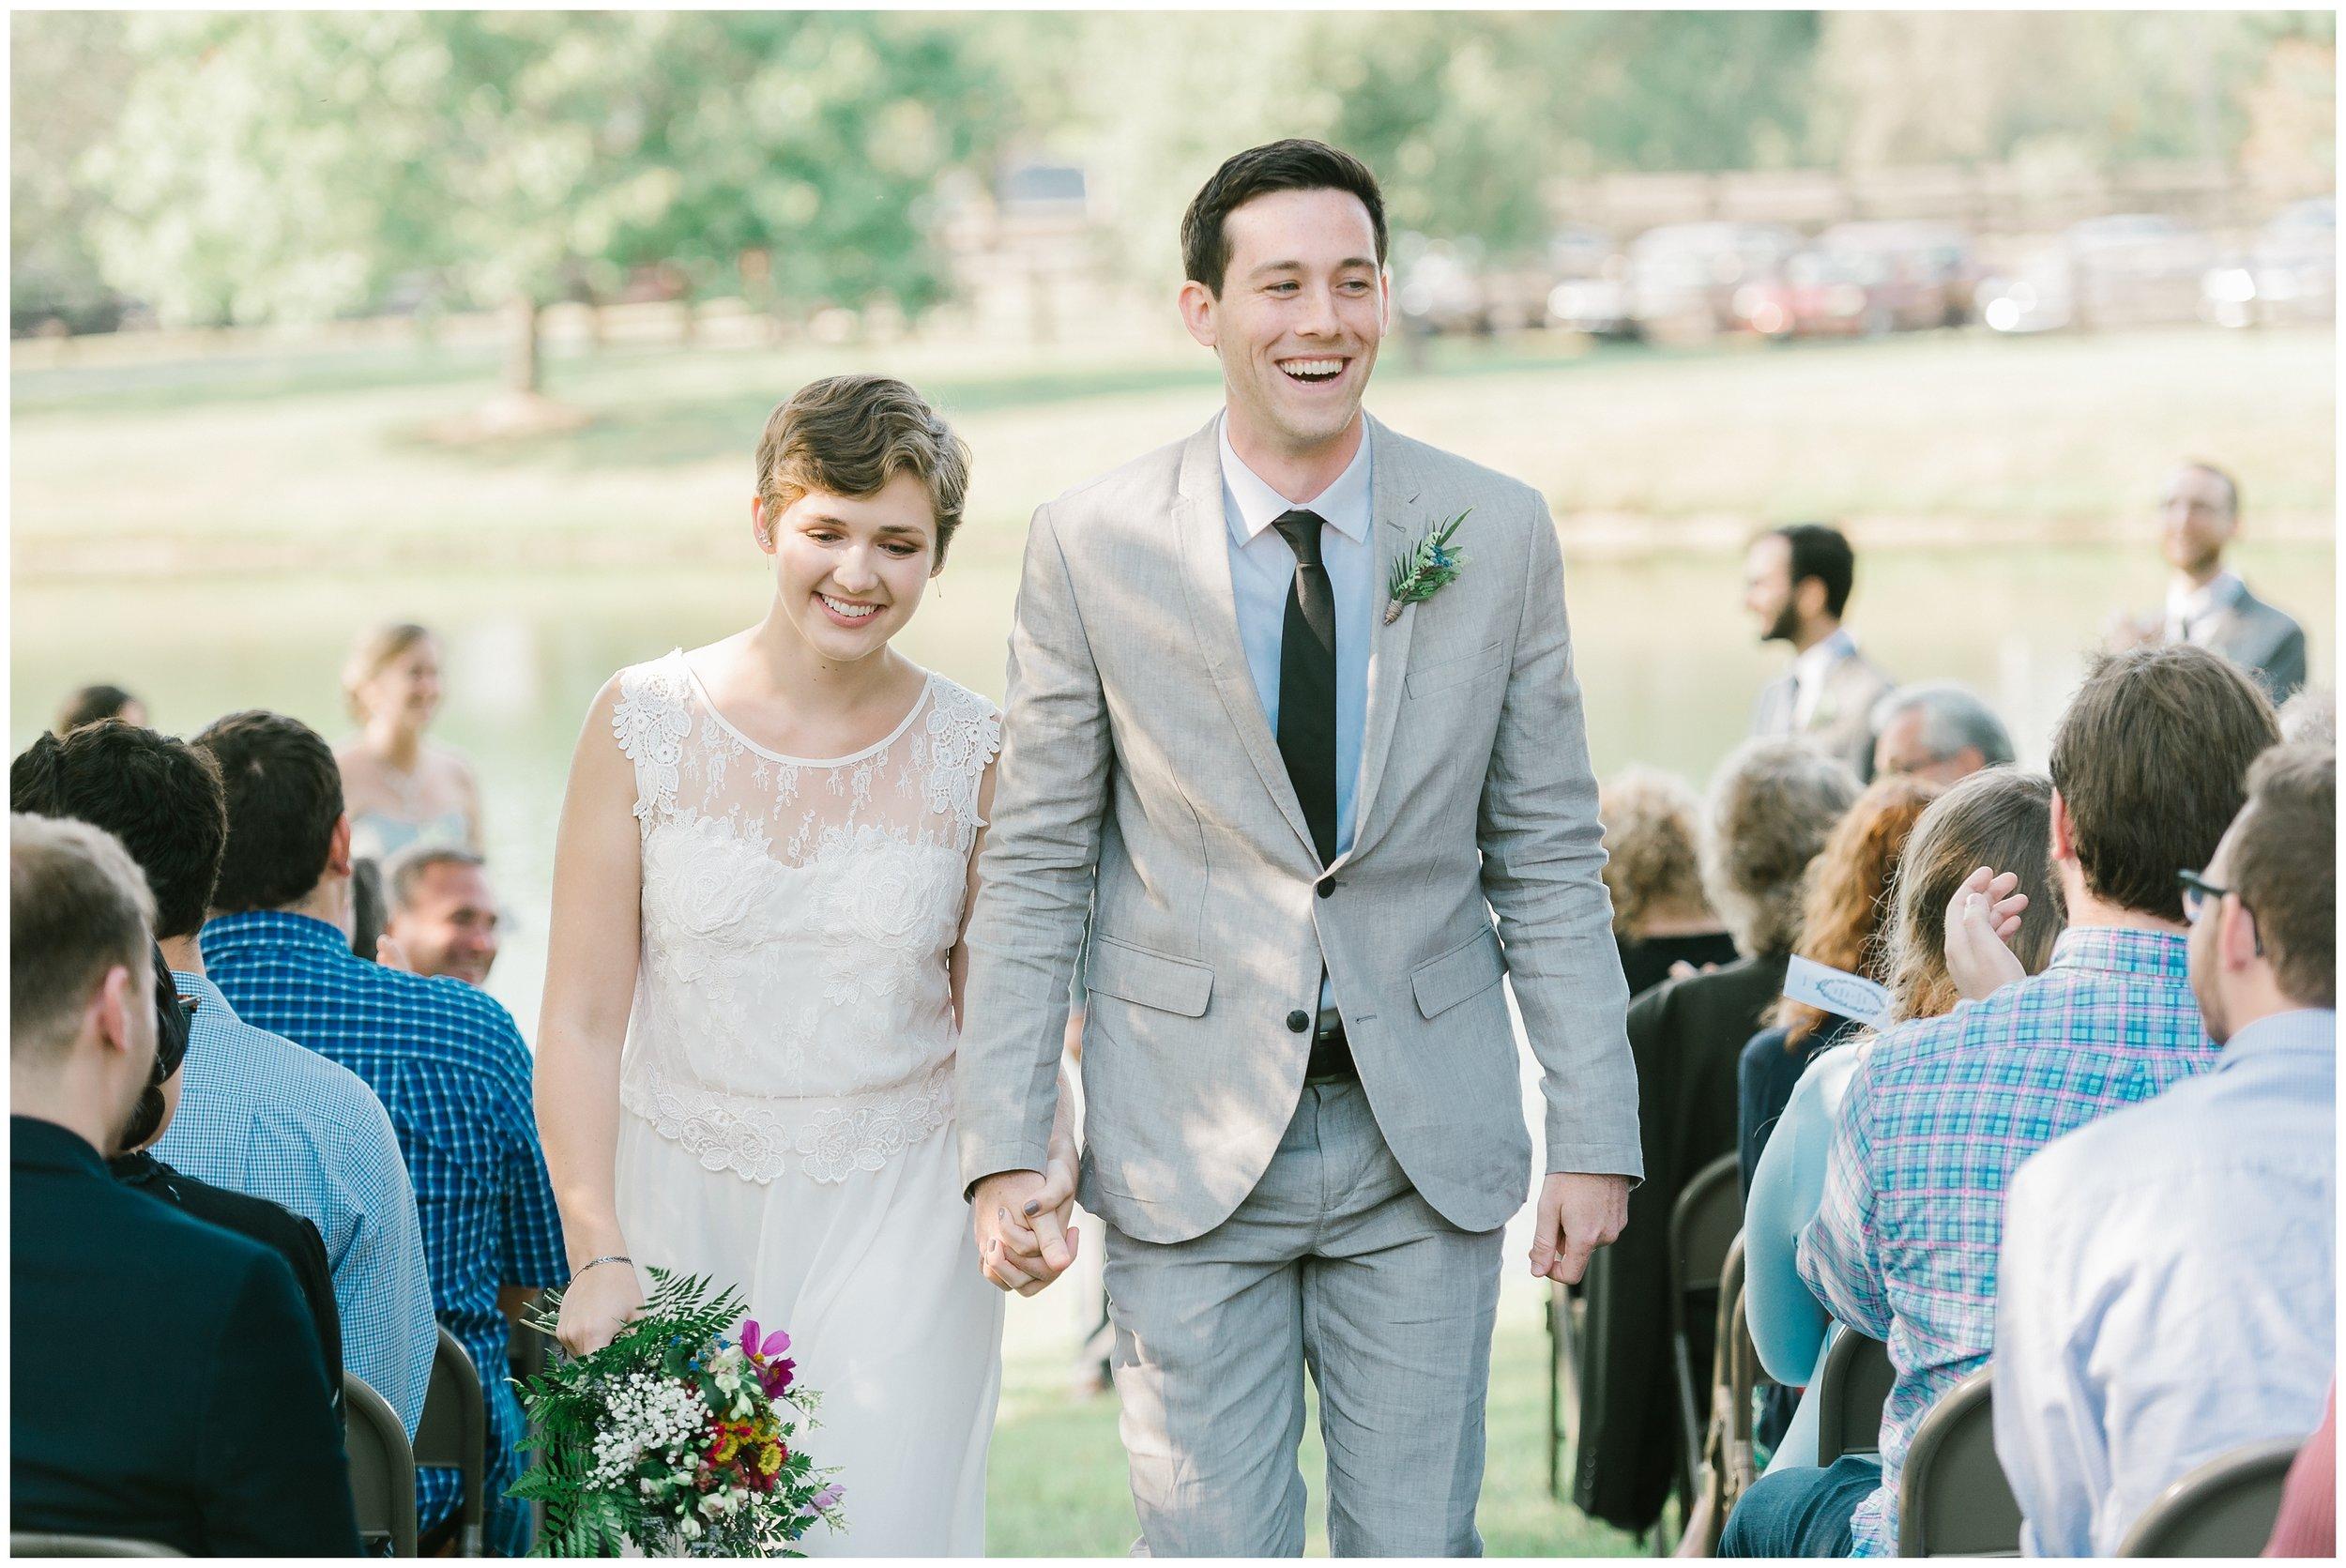 Rebecca_Shehorn_Photography_Indianapolis_Wedding_Photographer_7261.jpg